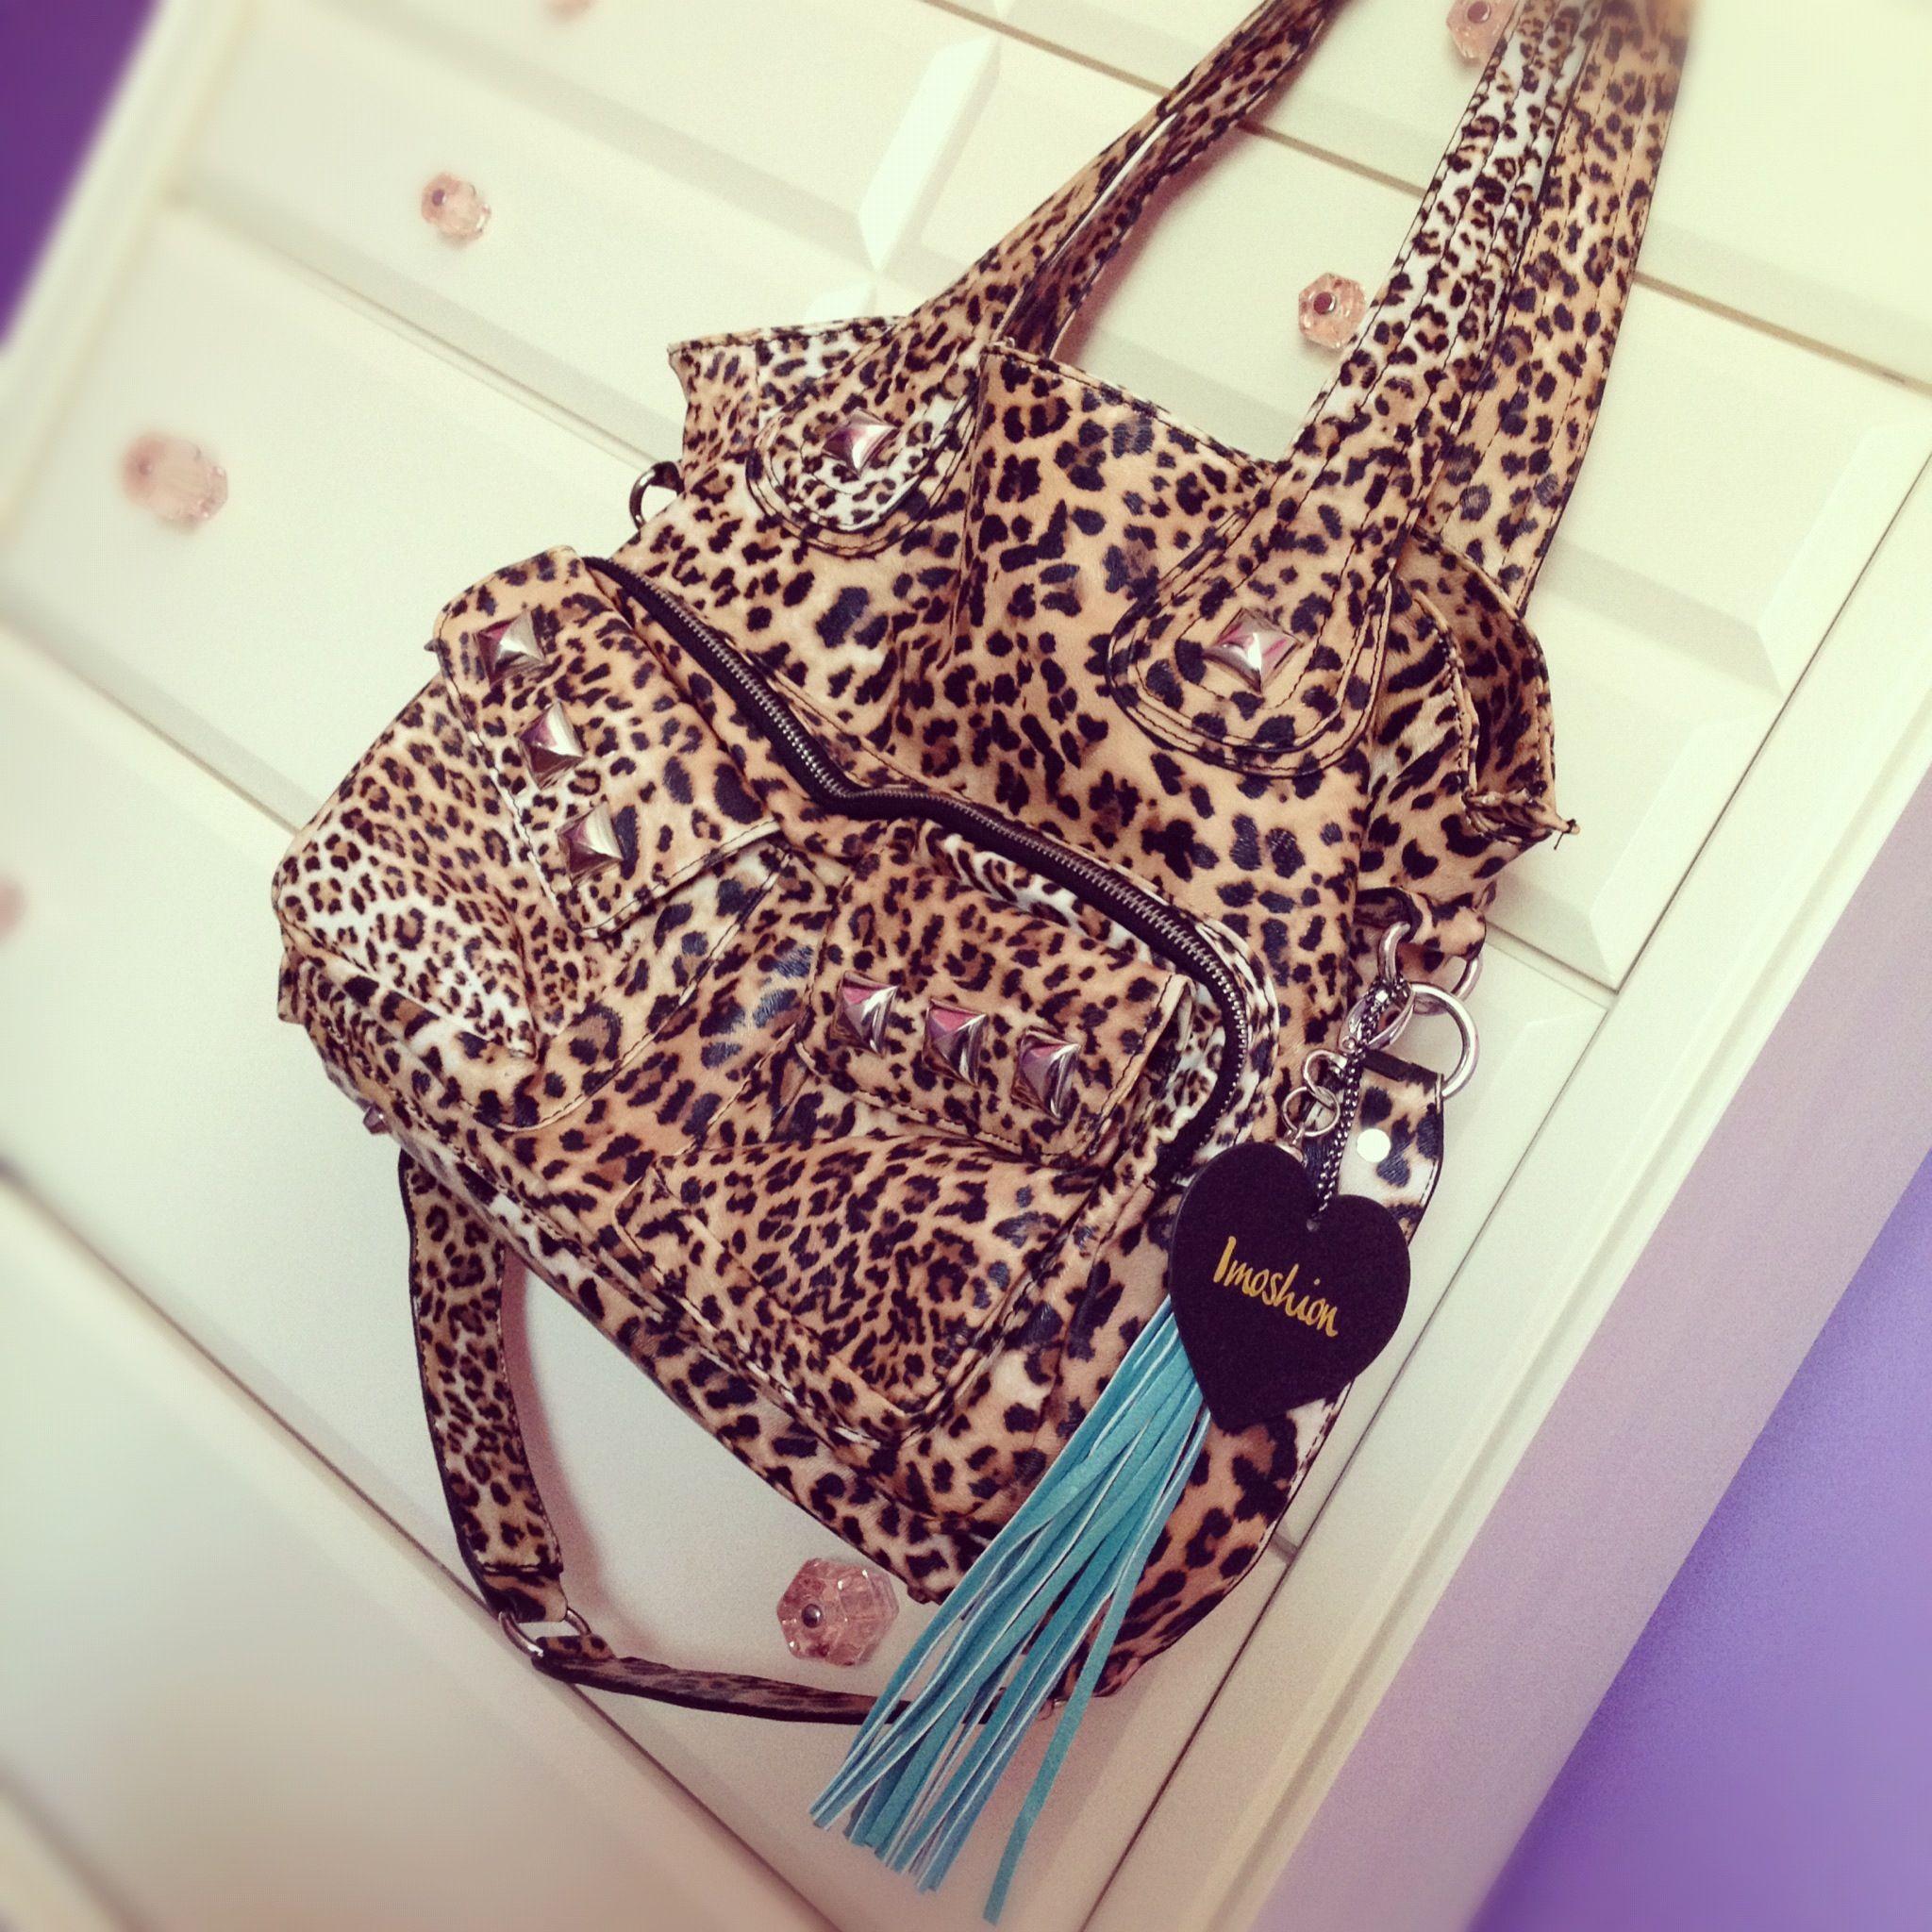 My Kandee Johnson Bag